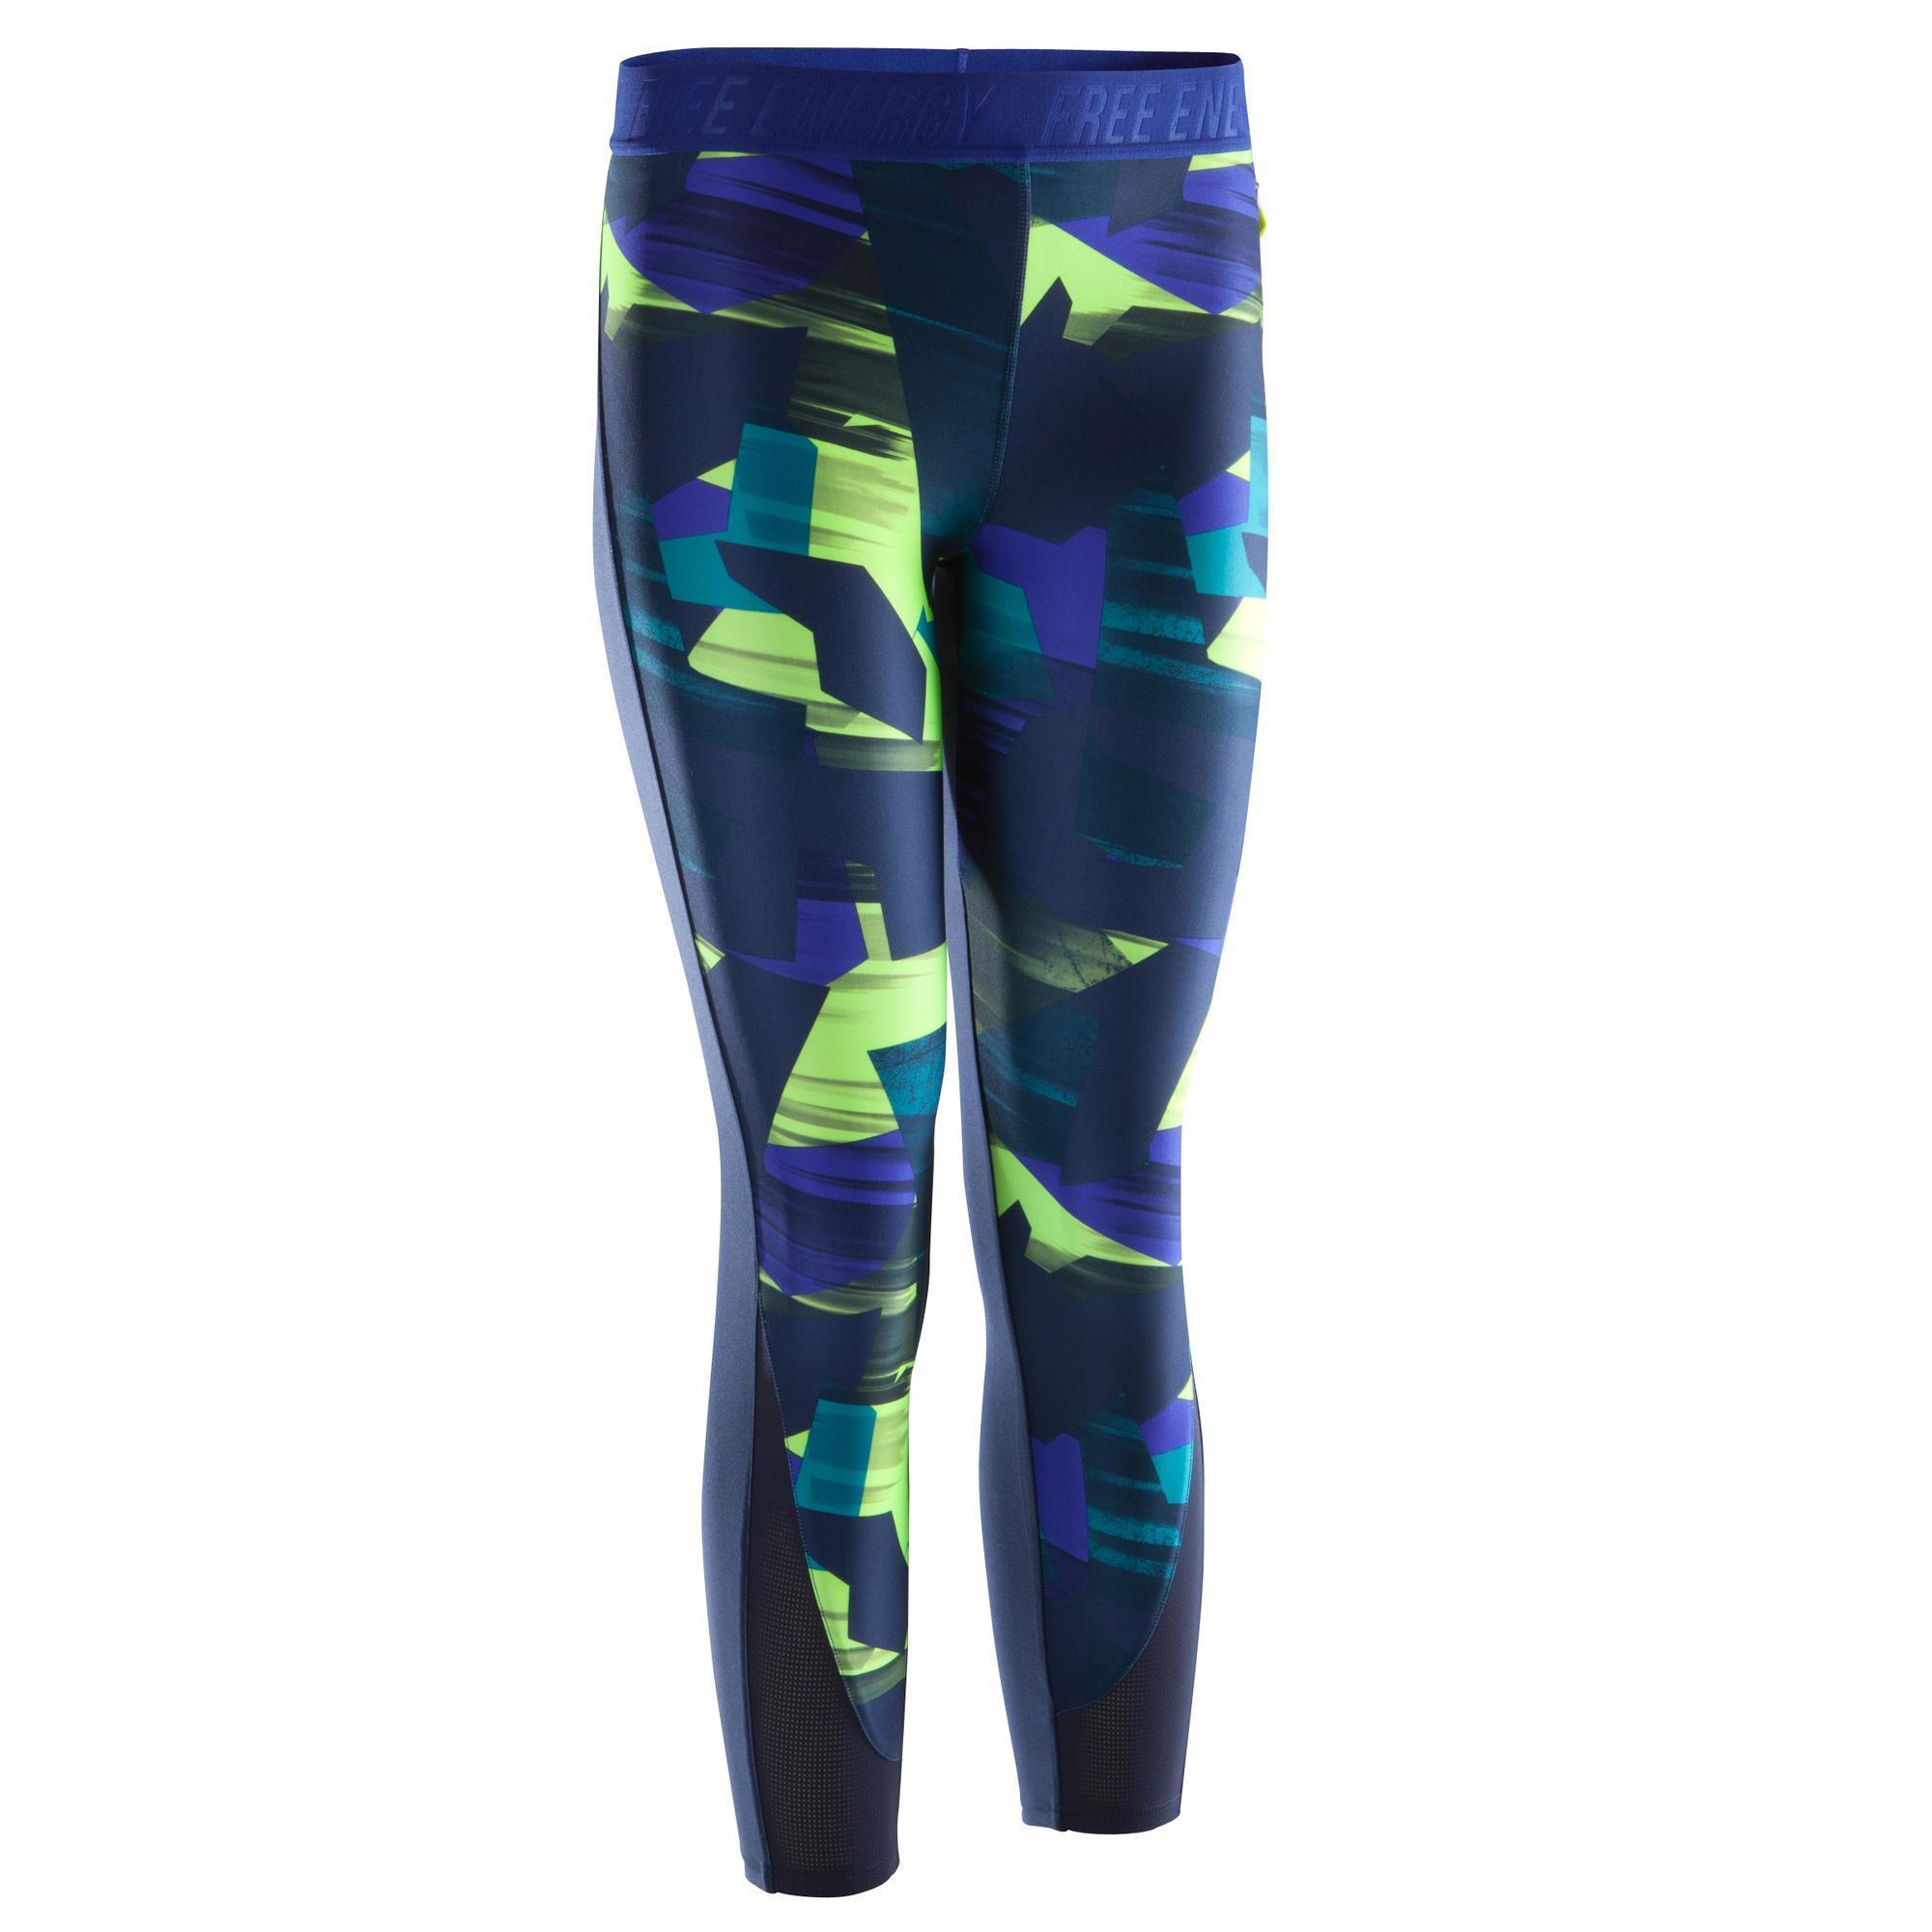 Fitness Leggings Nl: 7/8-fitnesslegging Cardio Energy + Dames Blauw/geel Met